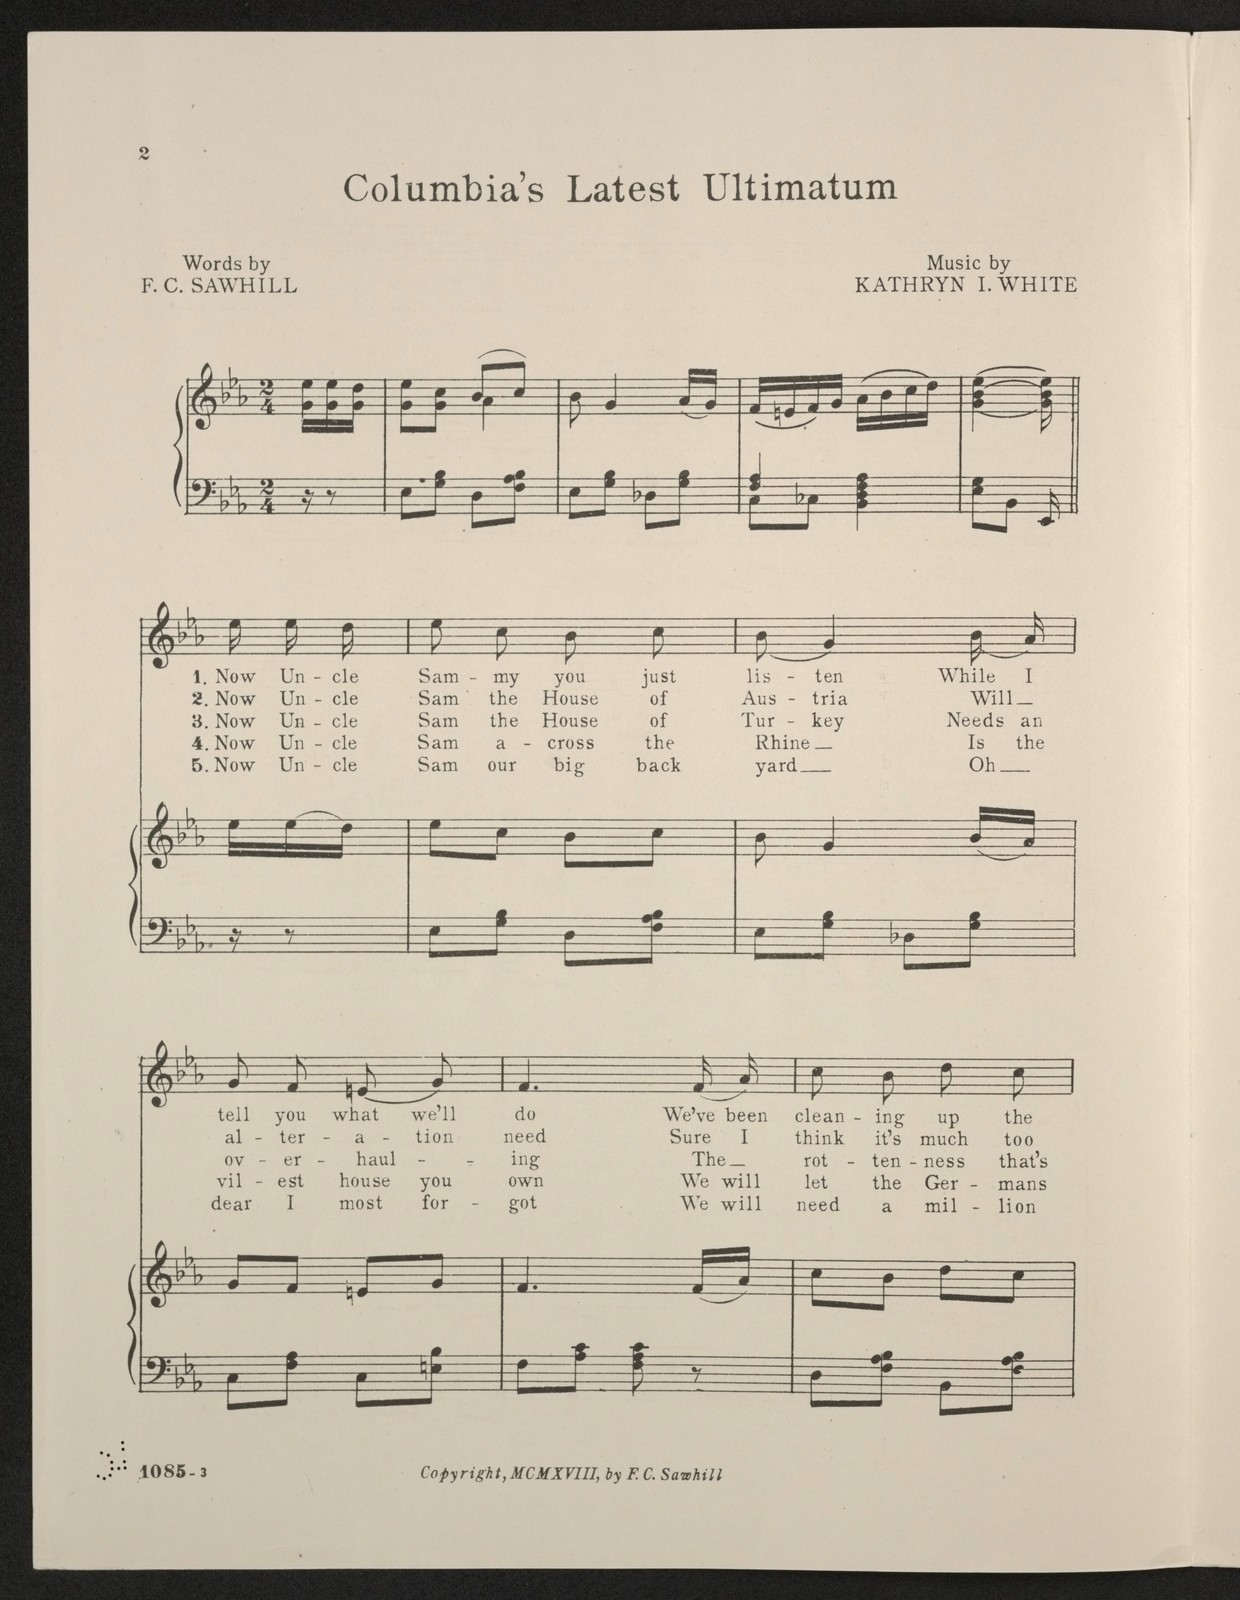 Columbia's latest ultimatum song